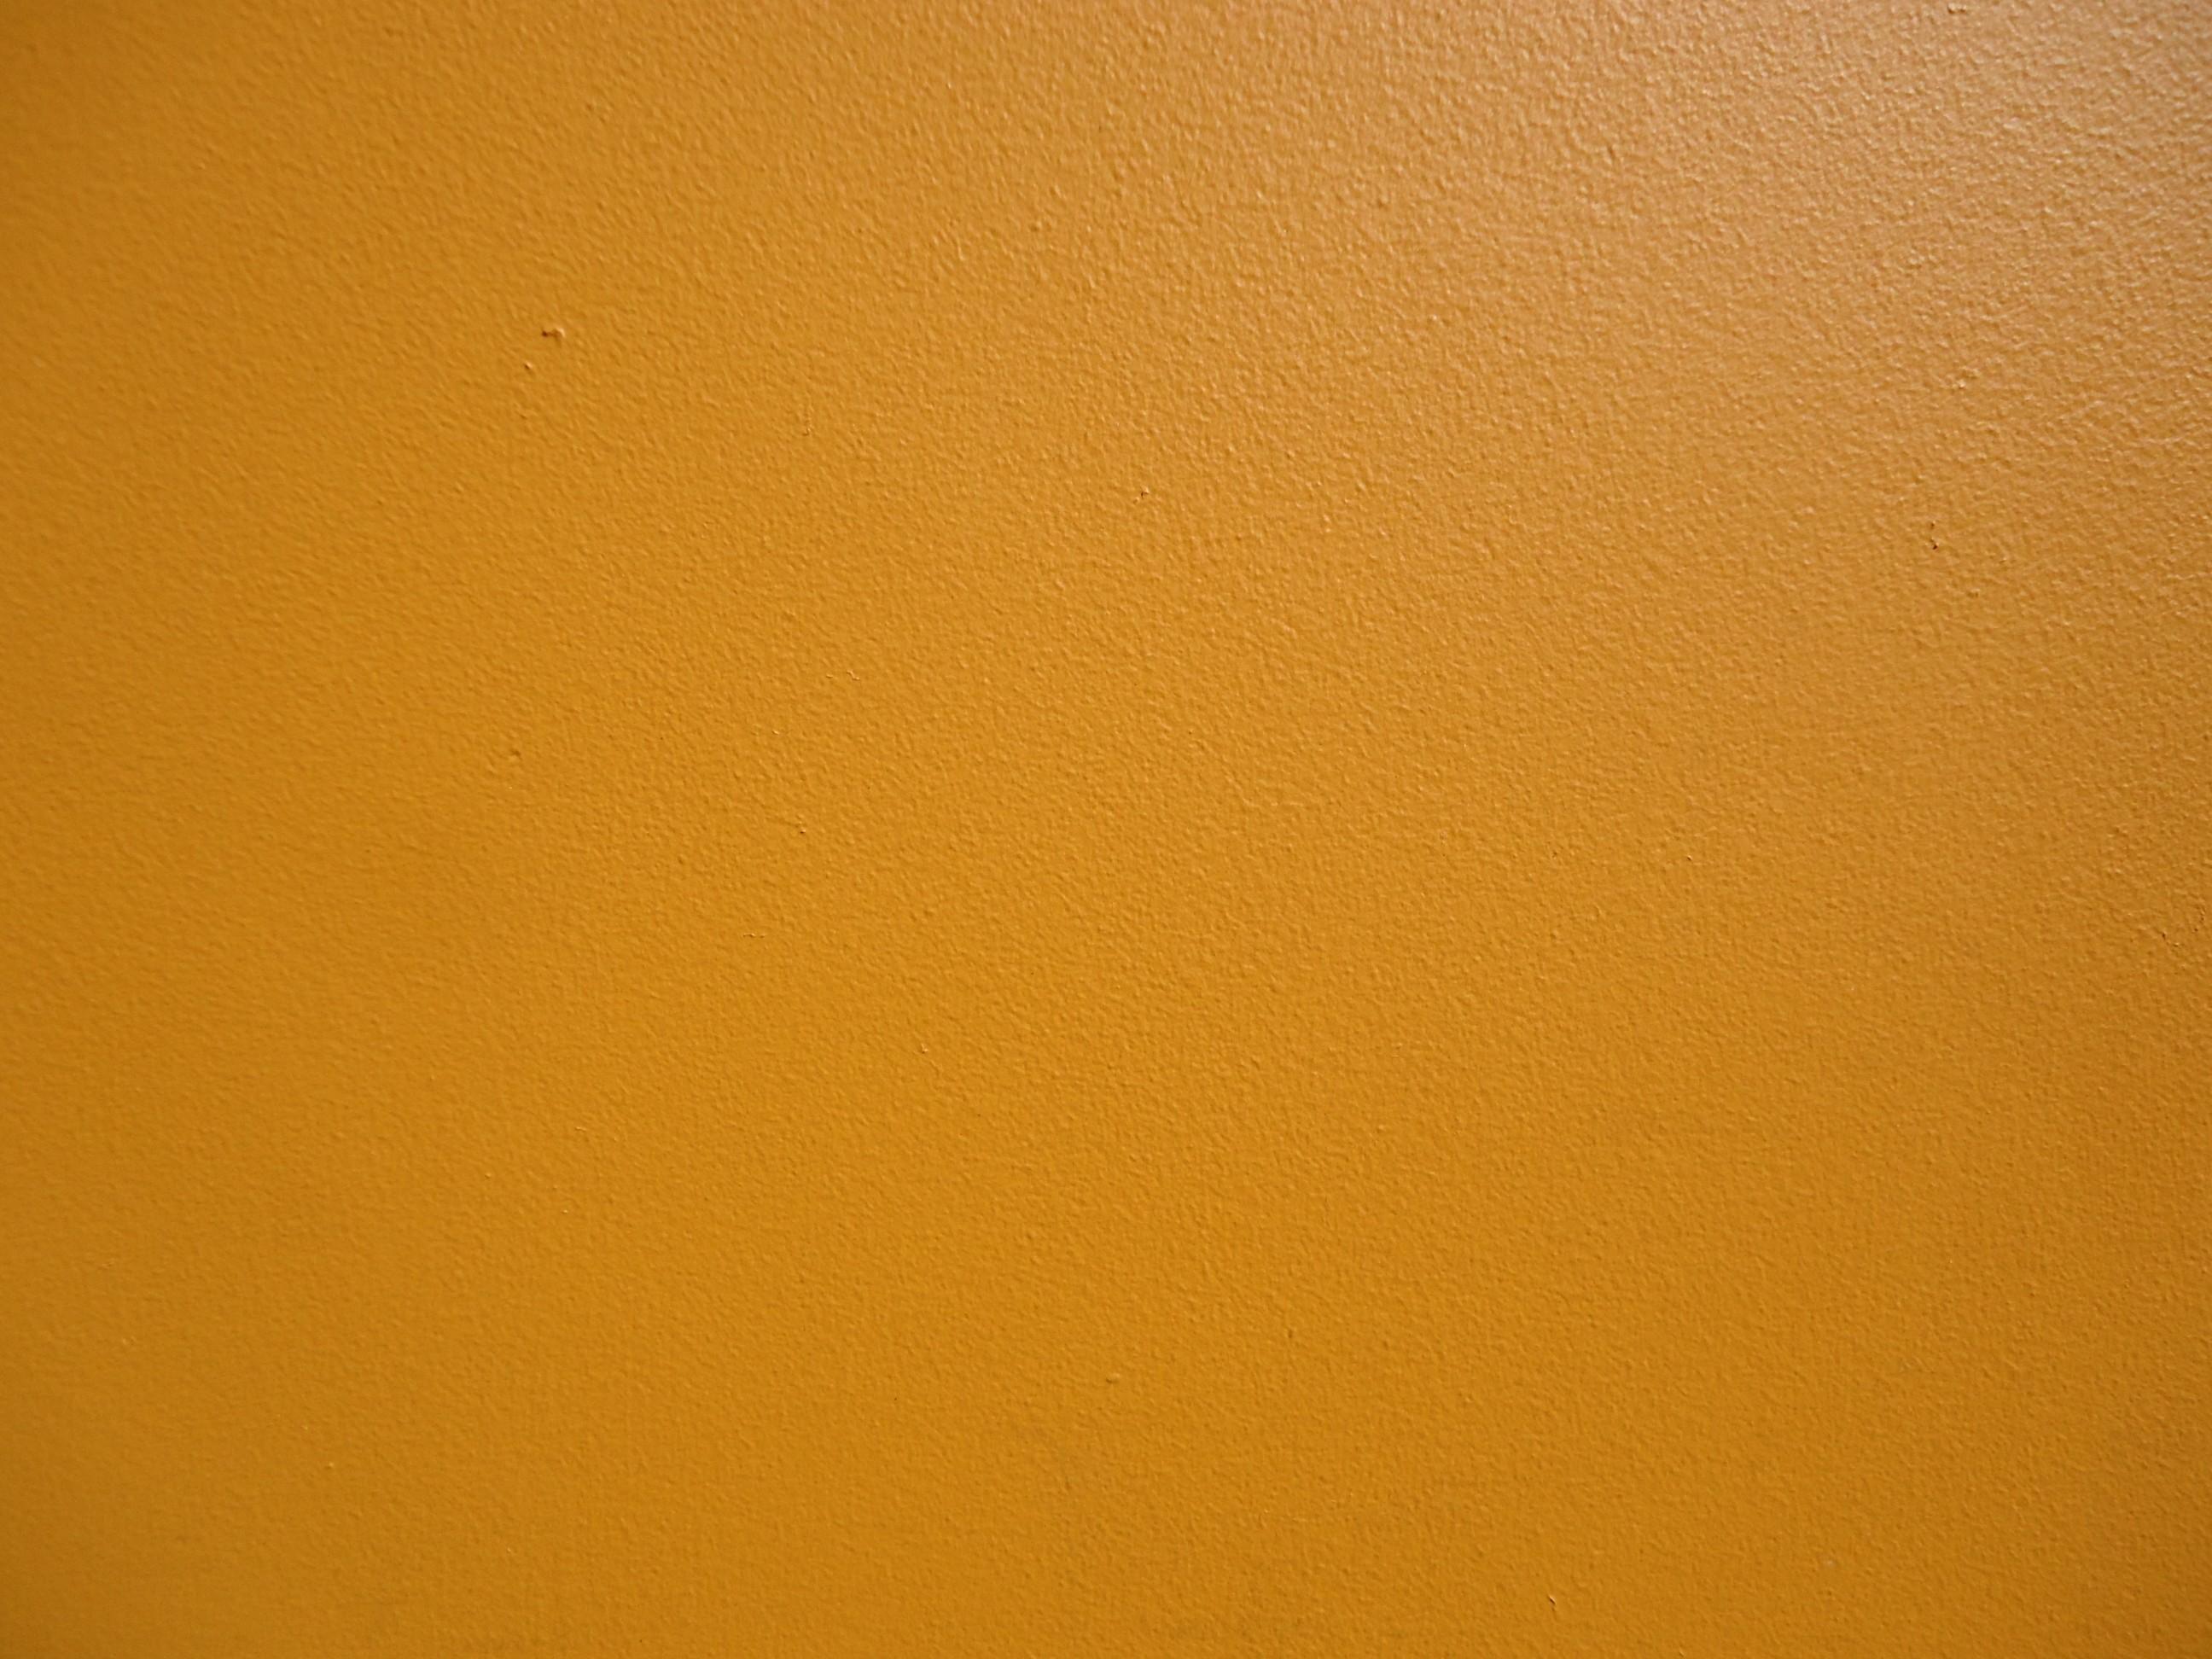 Orange Paint For Walls